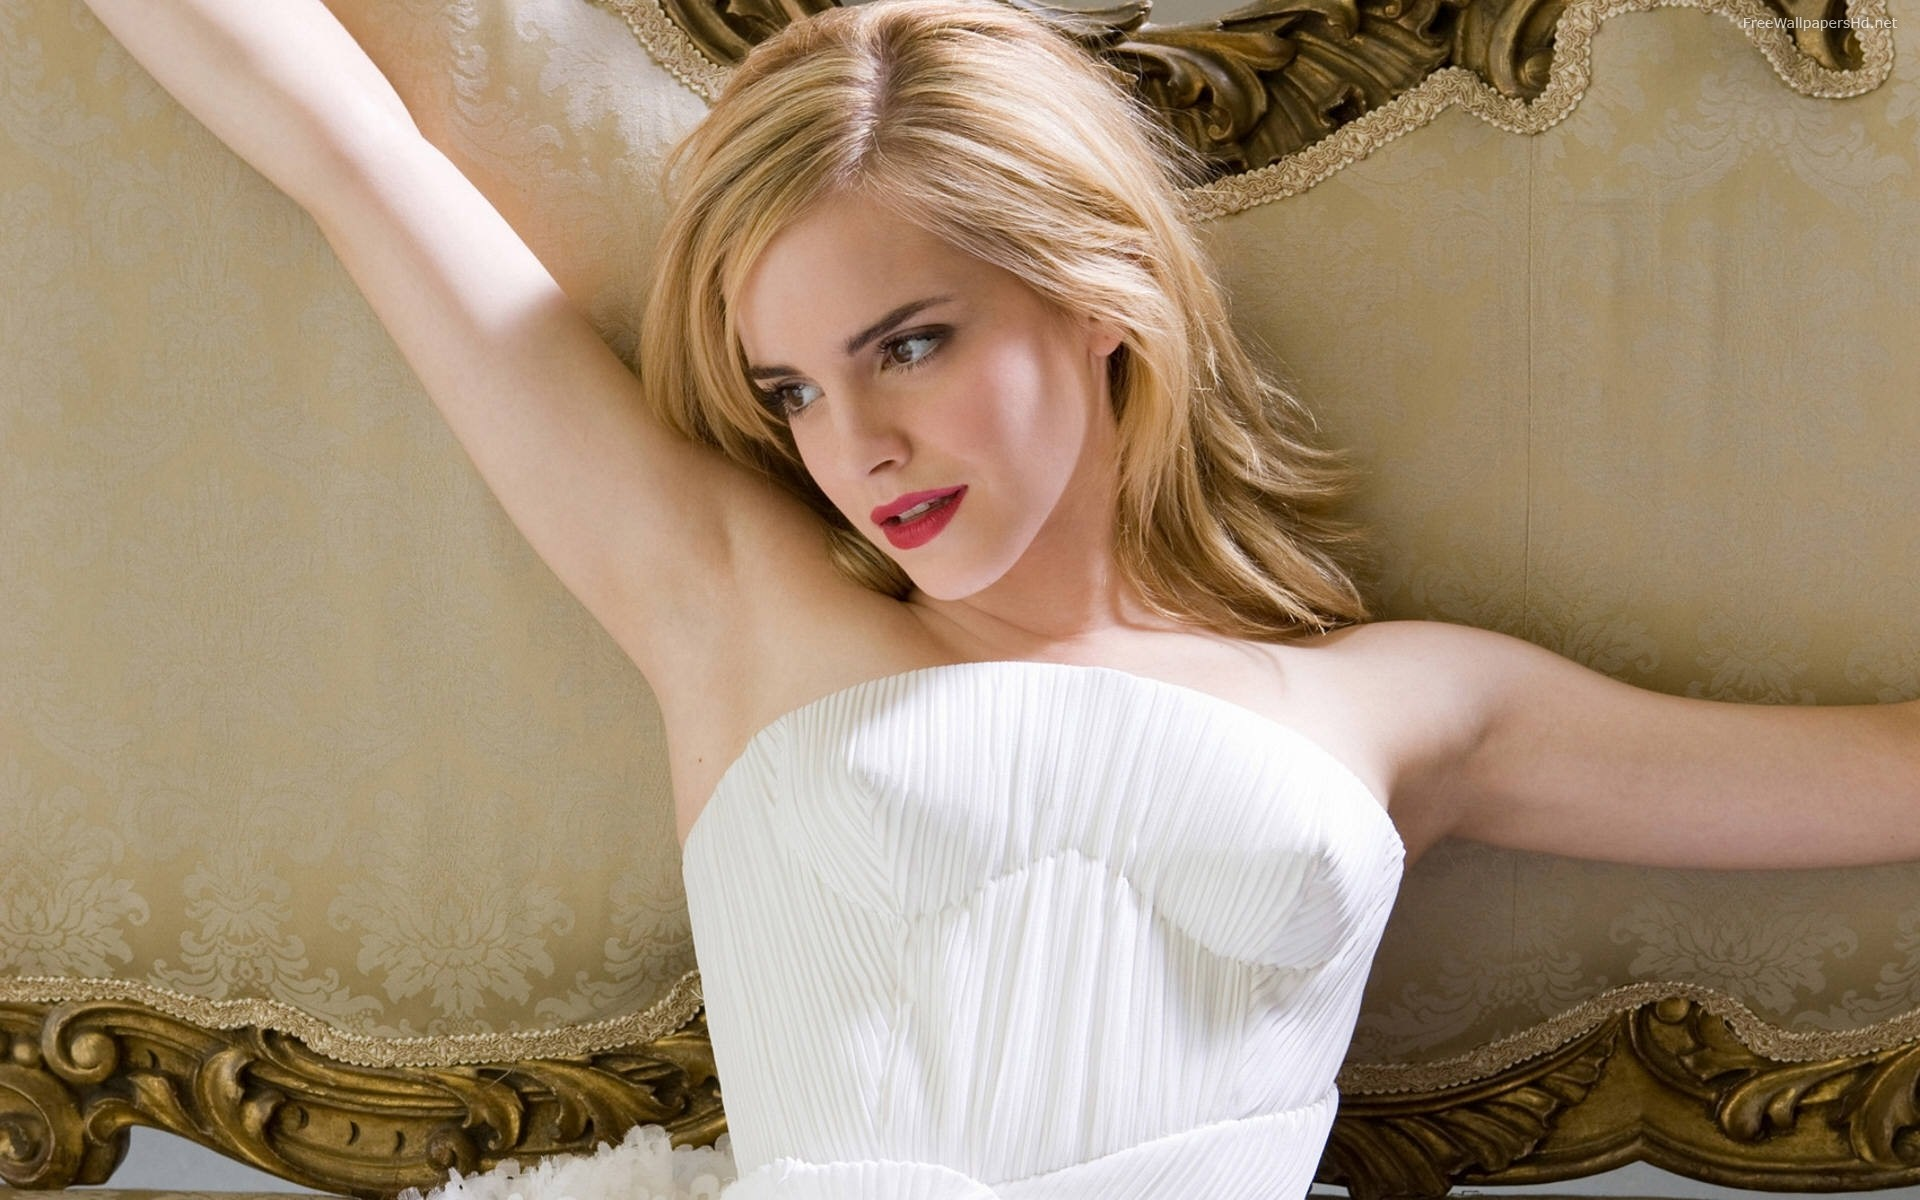 Beautiful Emma Watson HD Wallpapers HD Wallpapers 1920x1200